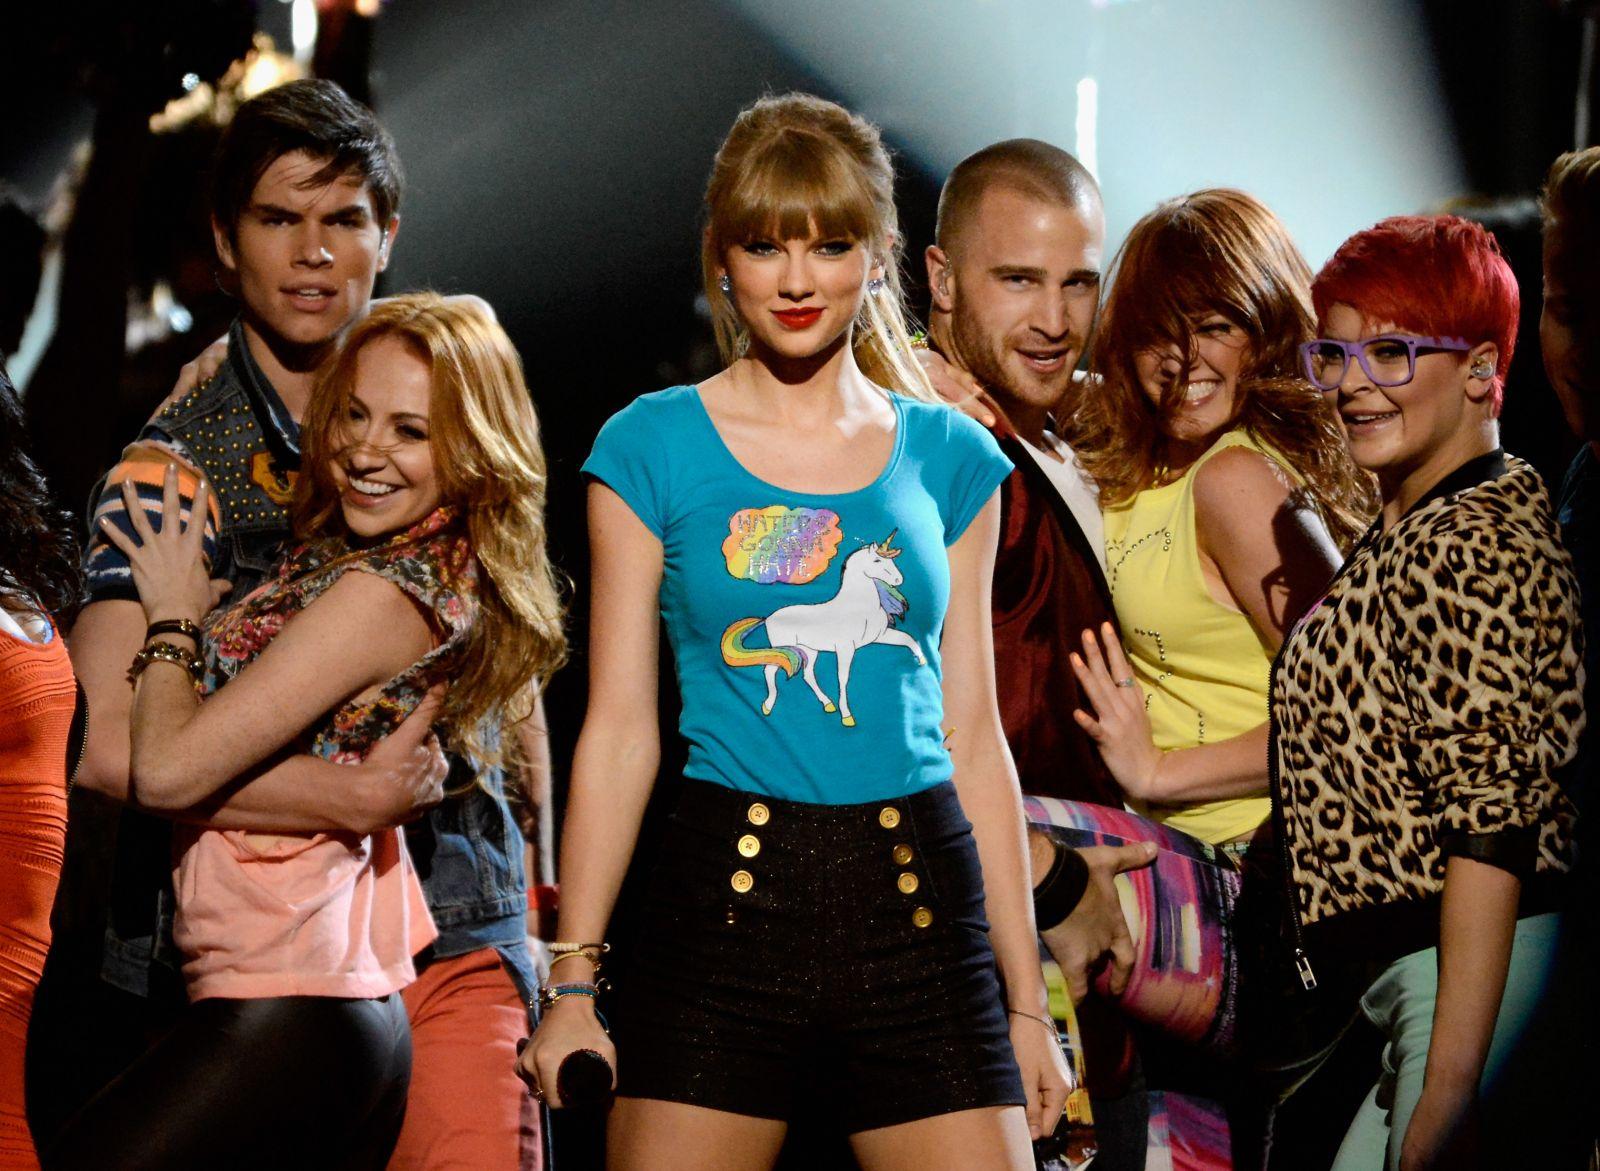 Звездам вручили награды на Billboard Music Awards-2013 - фото №1